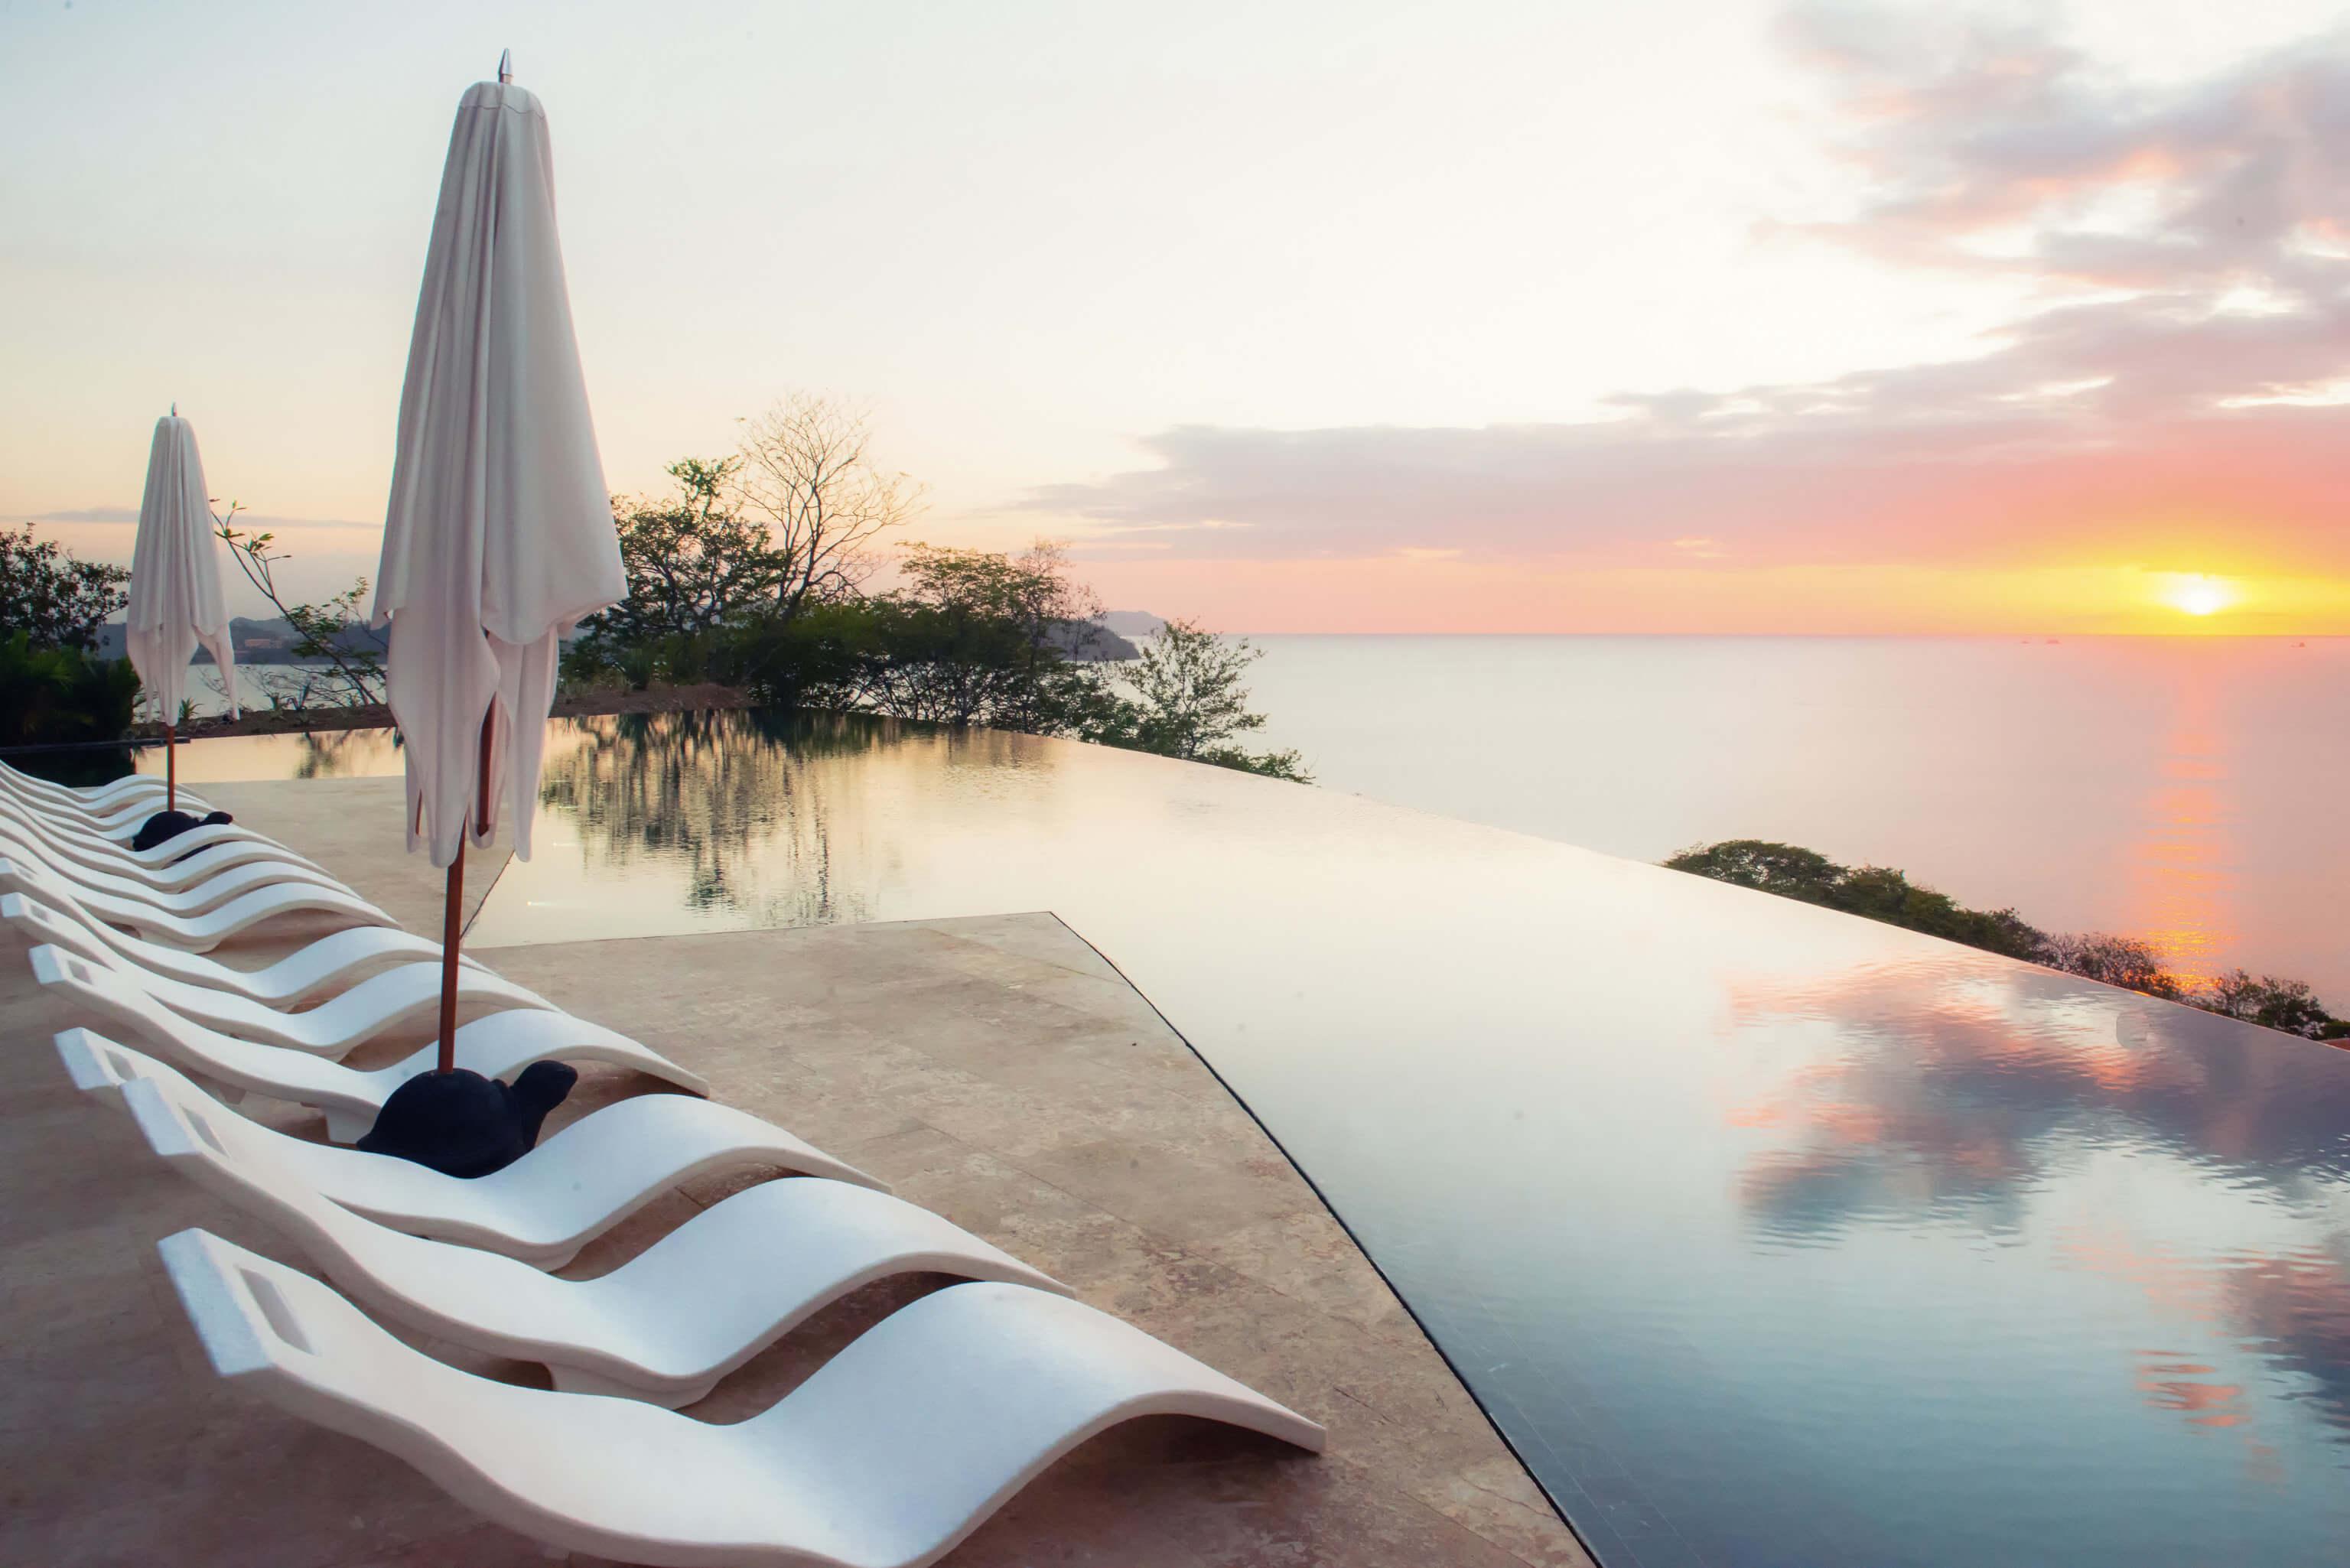 Boat Hotels Sea Sunset